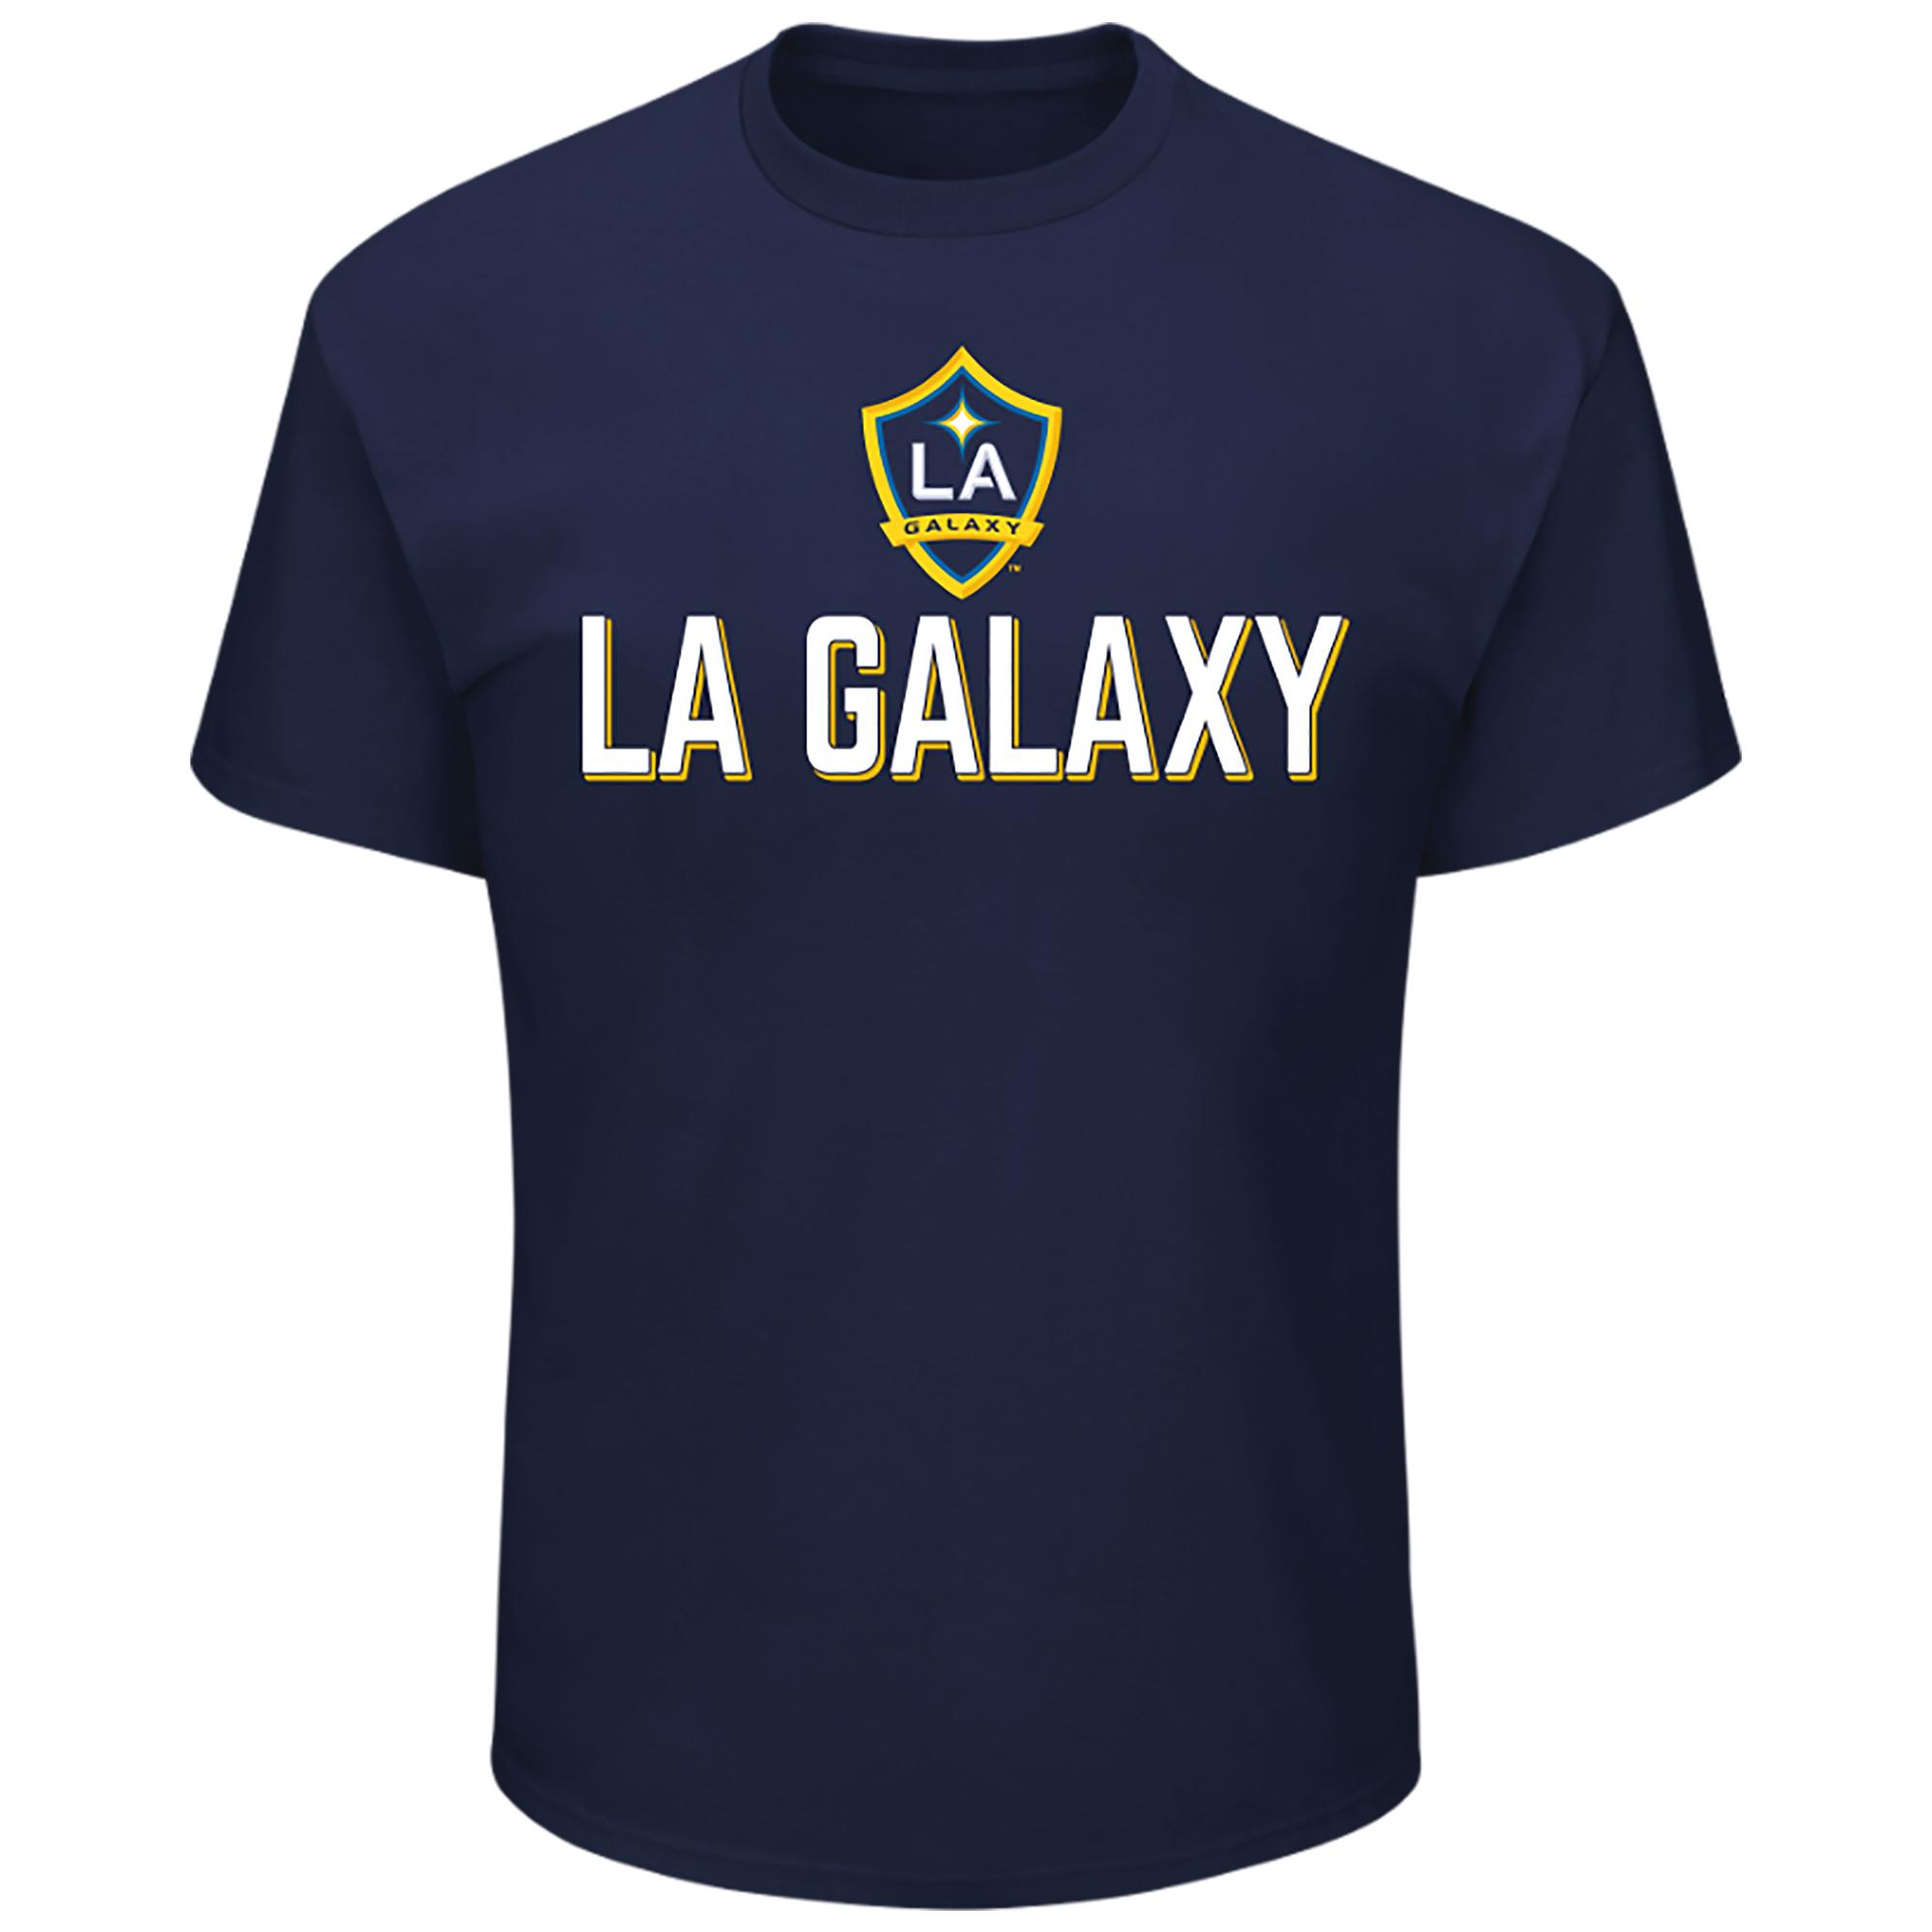 Men's Majestic Navy LA Galaxy Season After Season T-Shirt